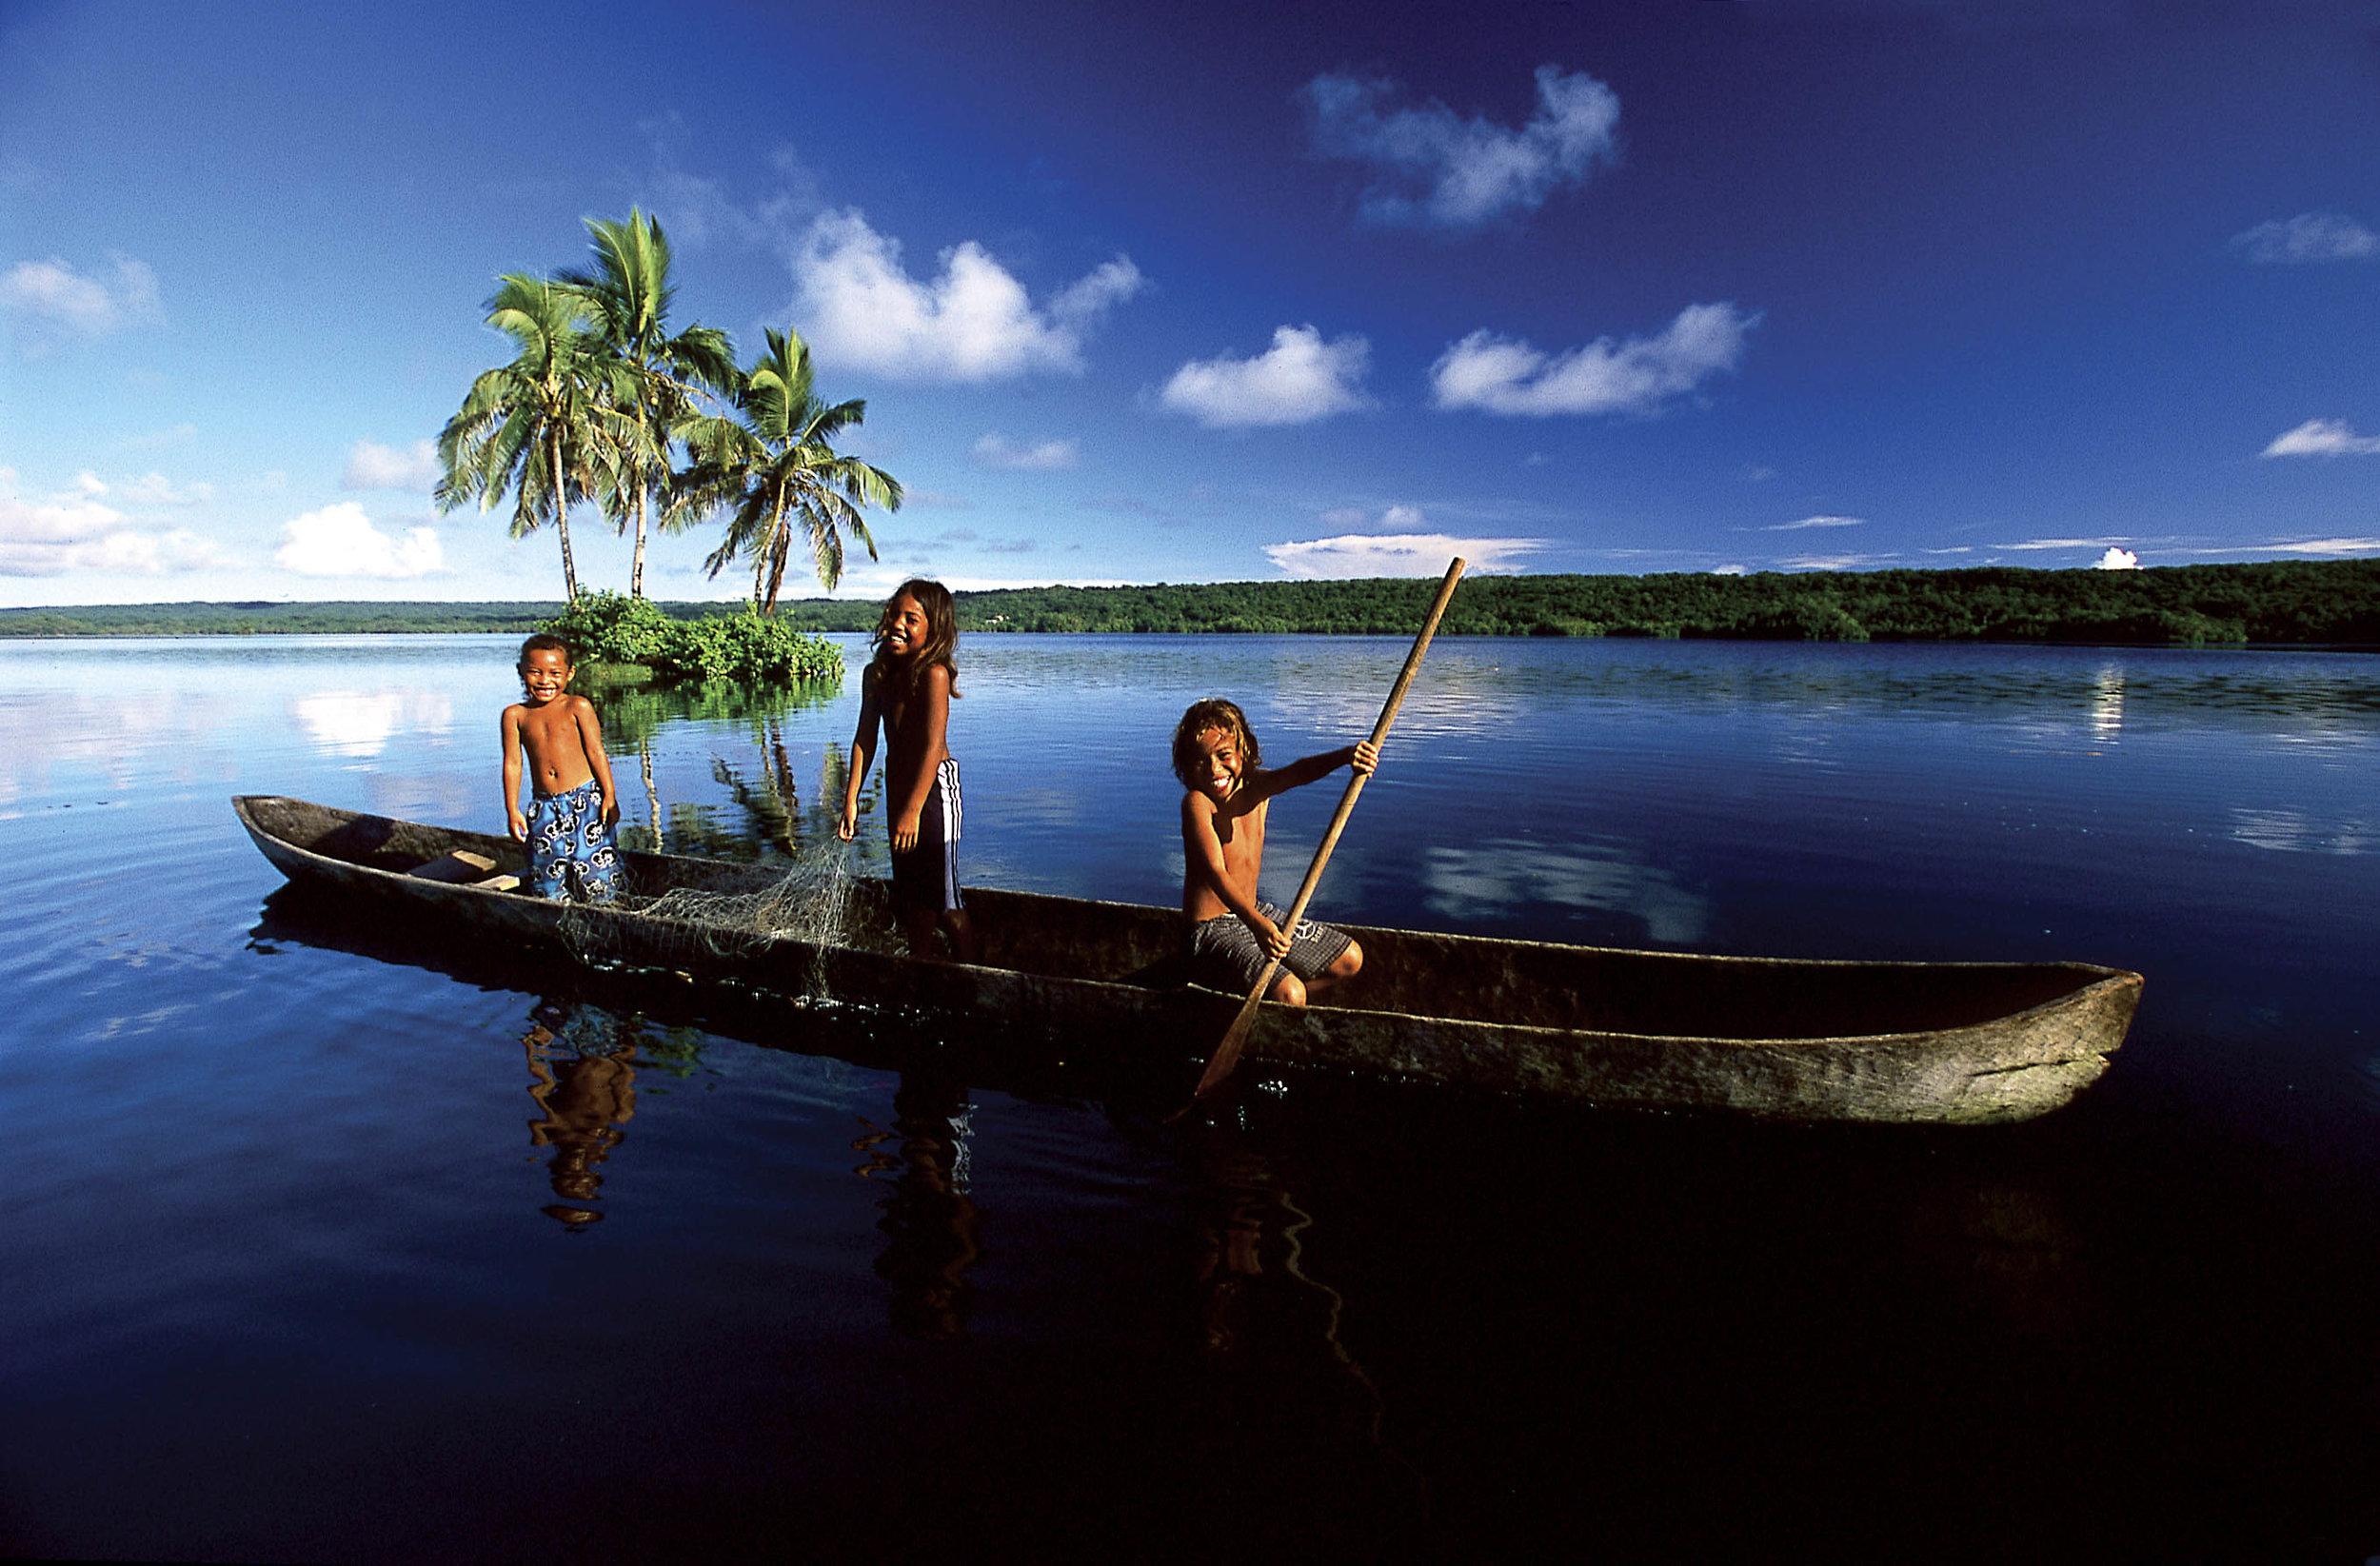 Kids of the Solomon Islands (image care of the Solomon Islands Visitors' Bureau).